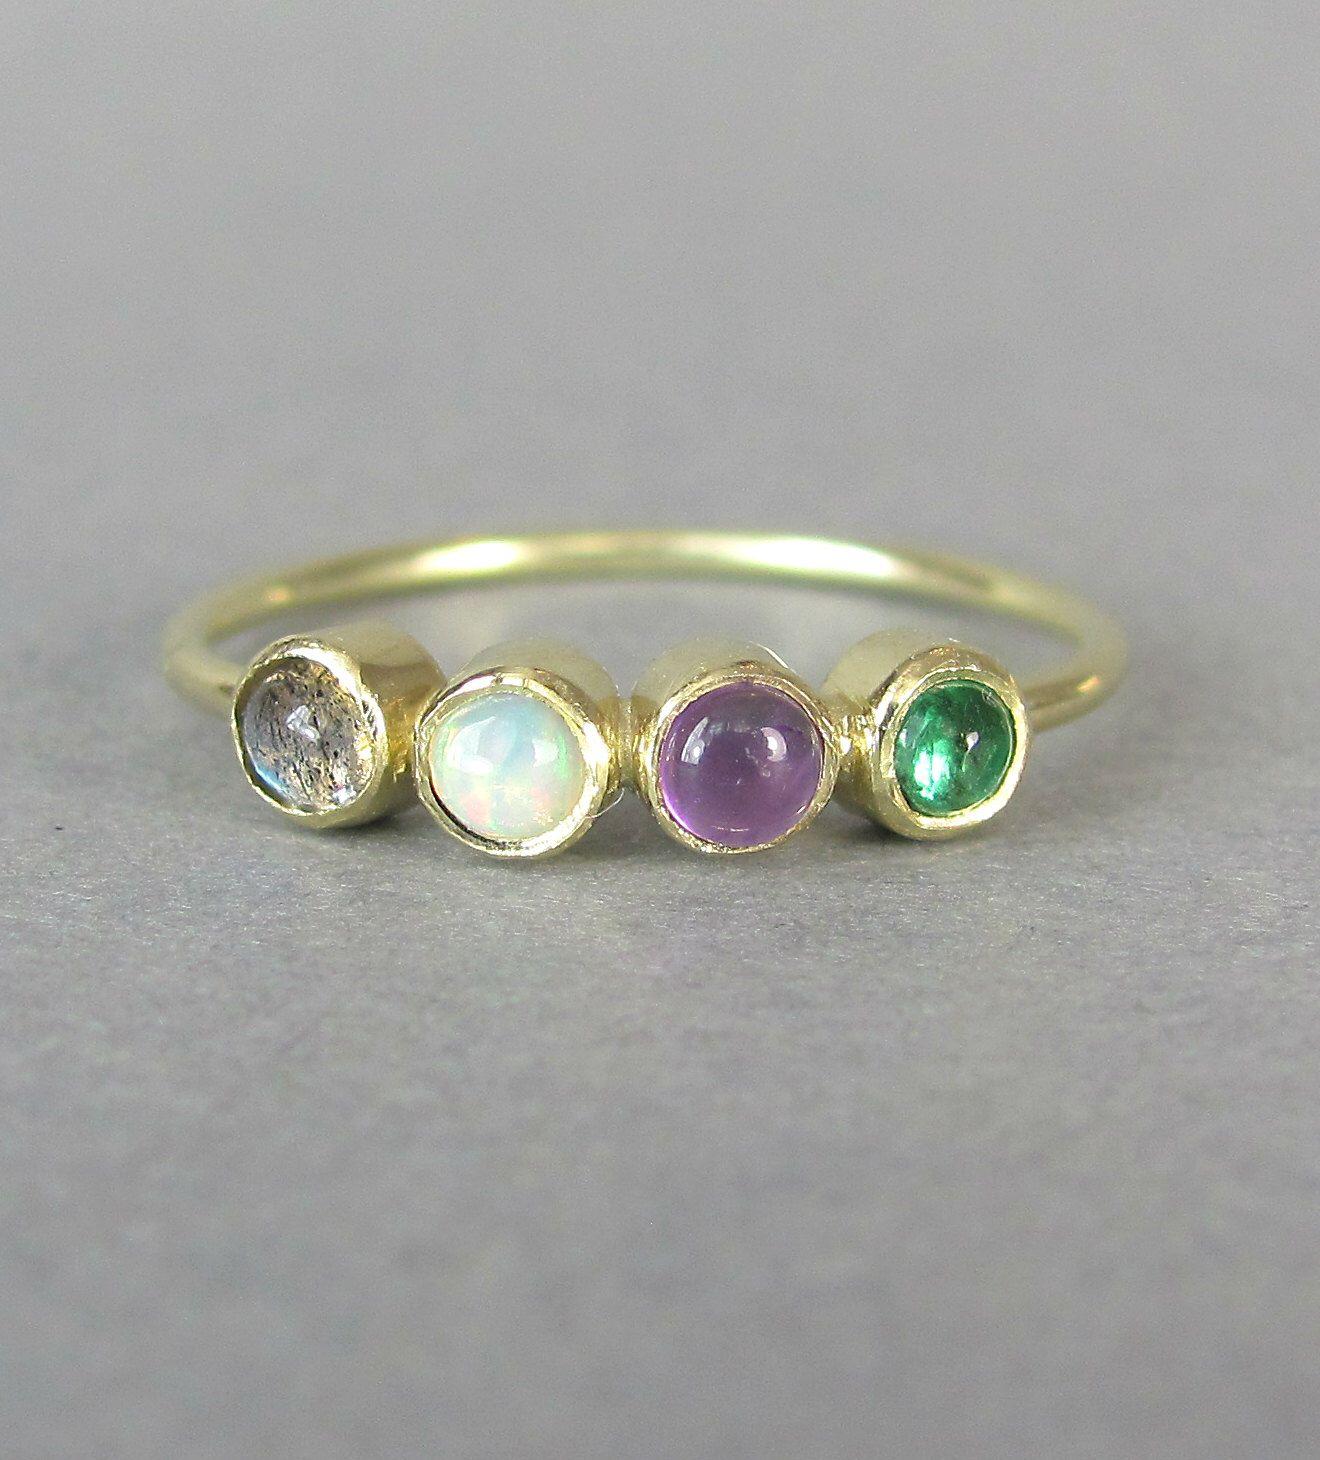 labradorite wedding ring LOVE acrostic gold ring handmade engagement ring labradorite opal violet amethyst emerald minimalist stacking ring wedding ring